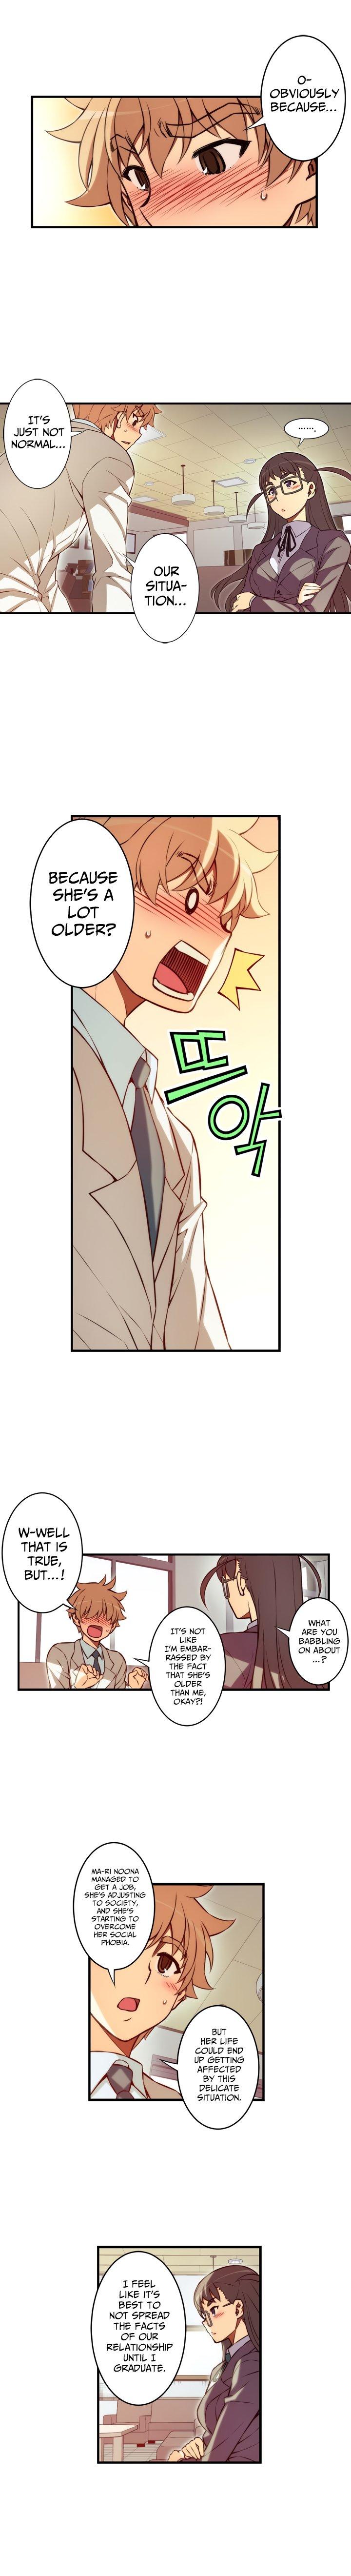 Manga The Fiancées Live Together - Chapter 109 Page 6